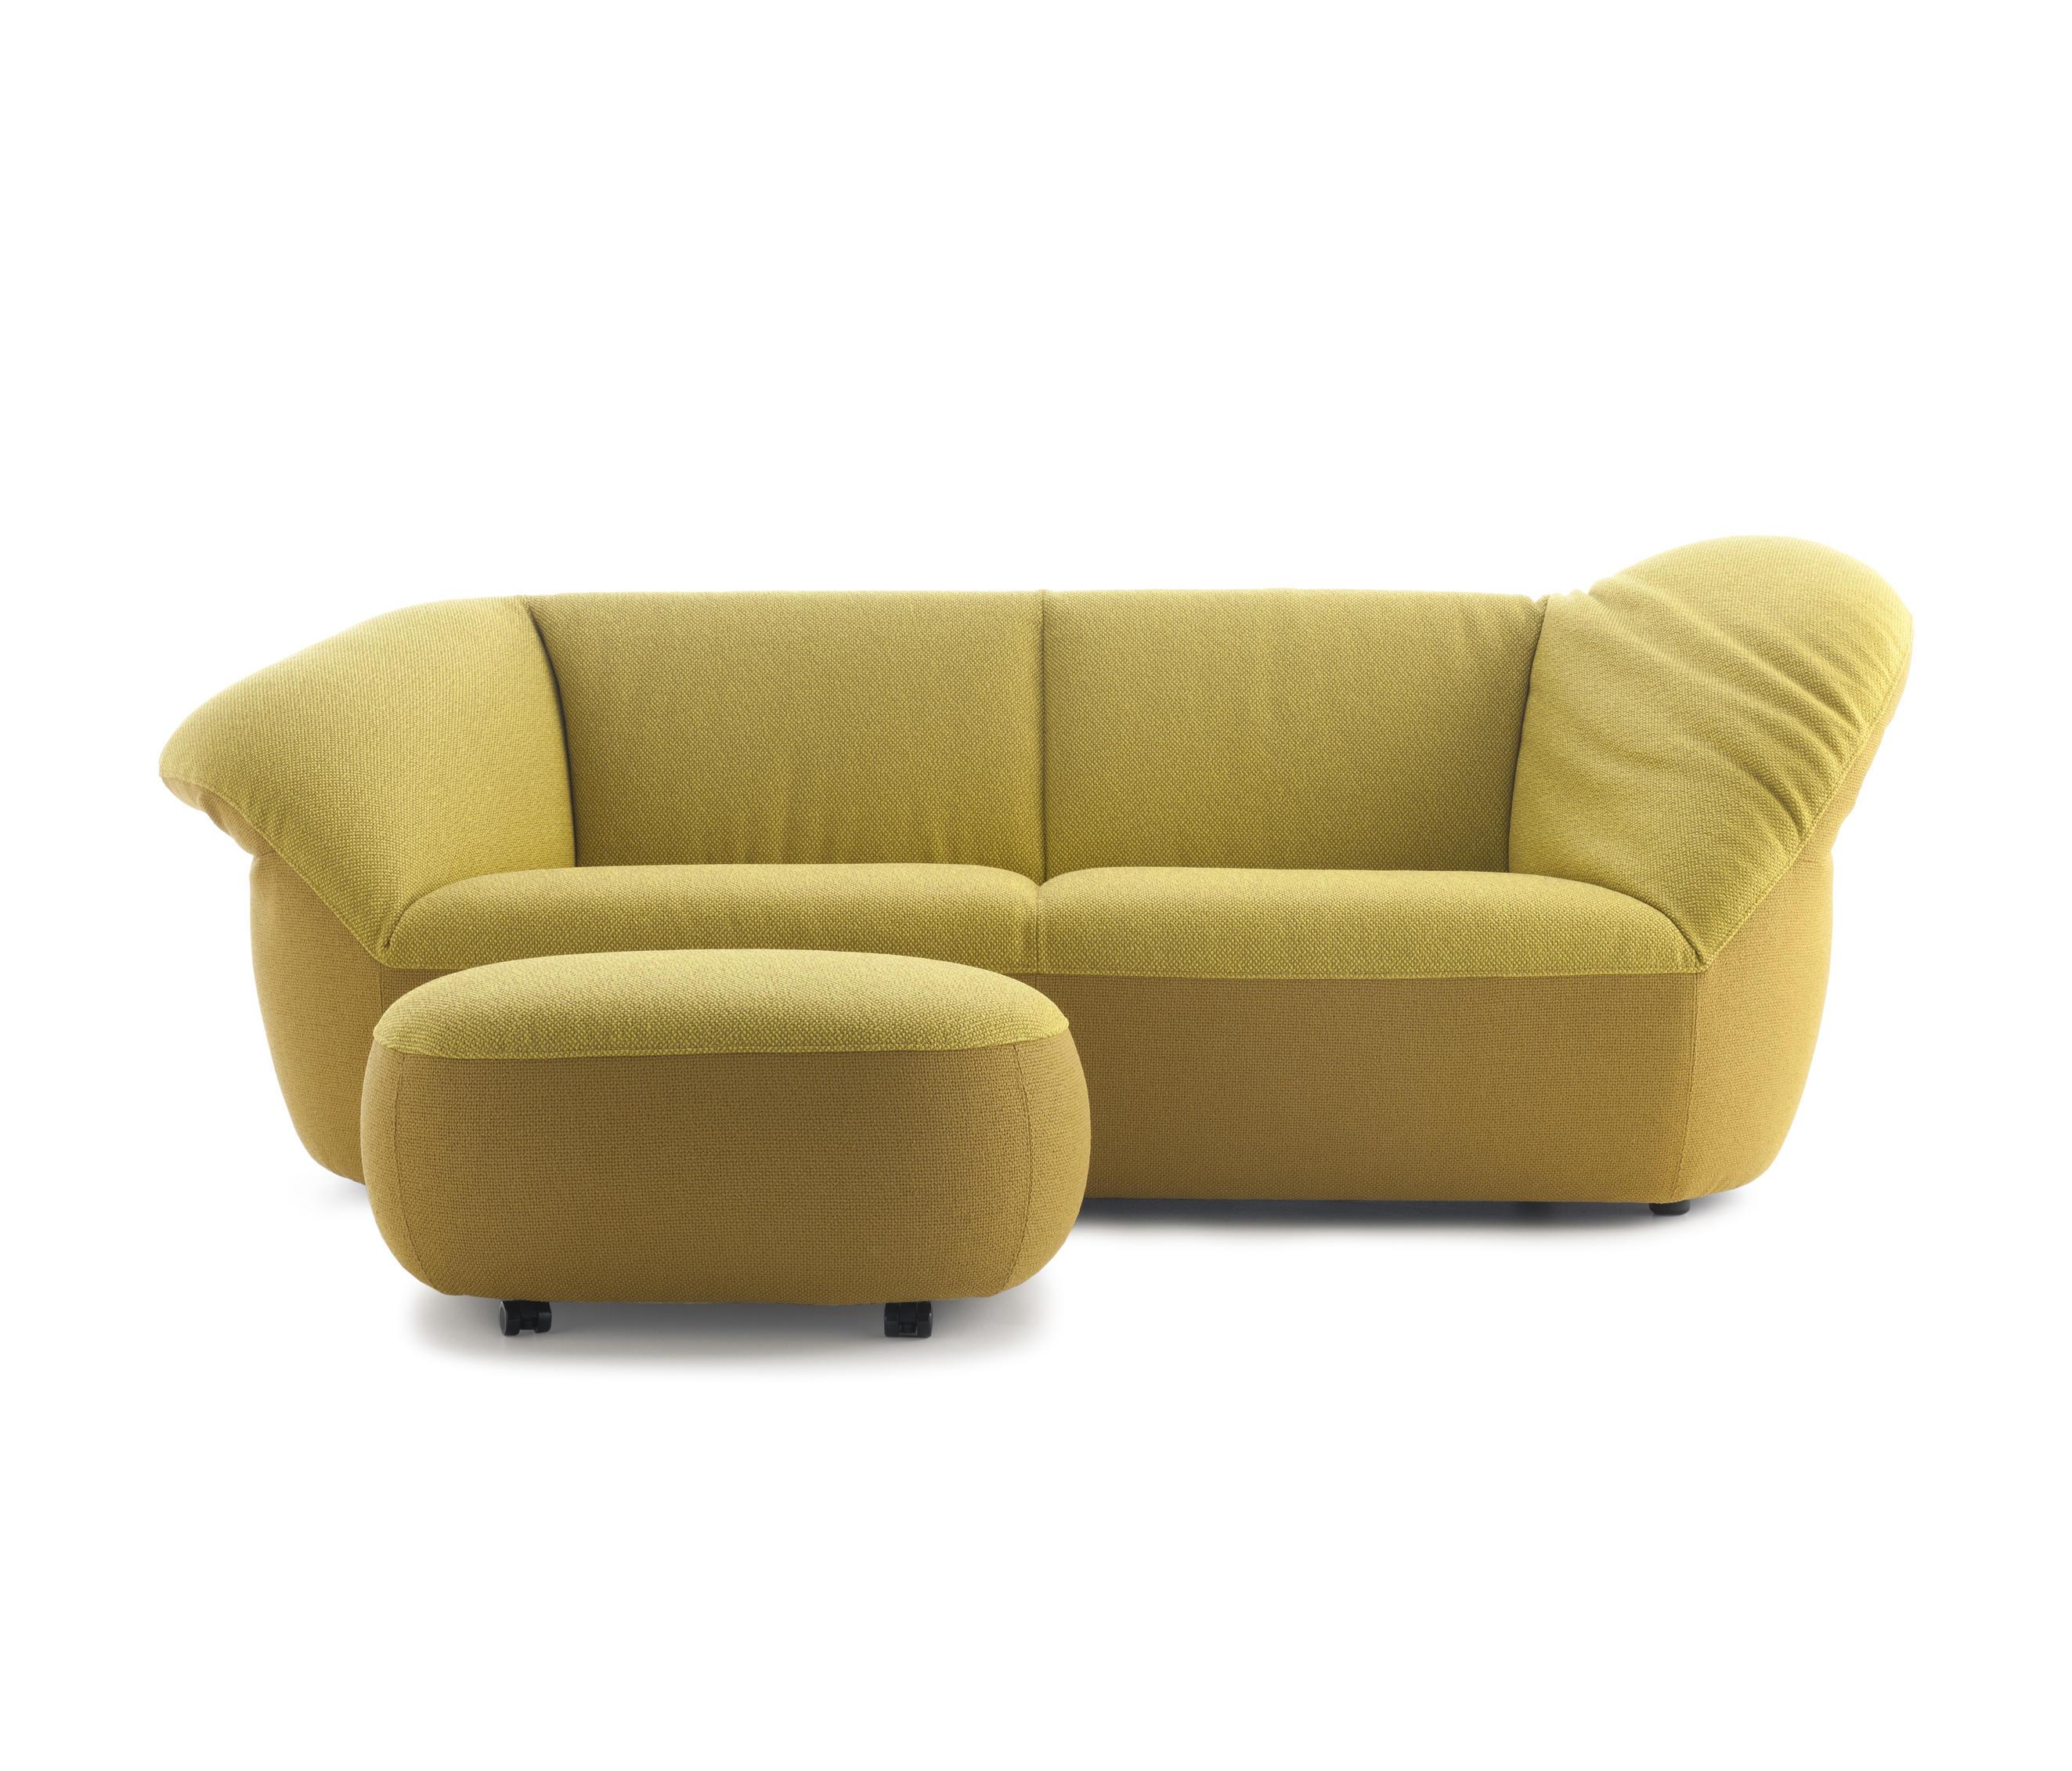 gynko sofa loungesofas von leolux architonic. Black Bedroom Furniture Sets. Home Design Ideas